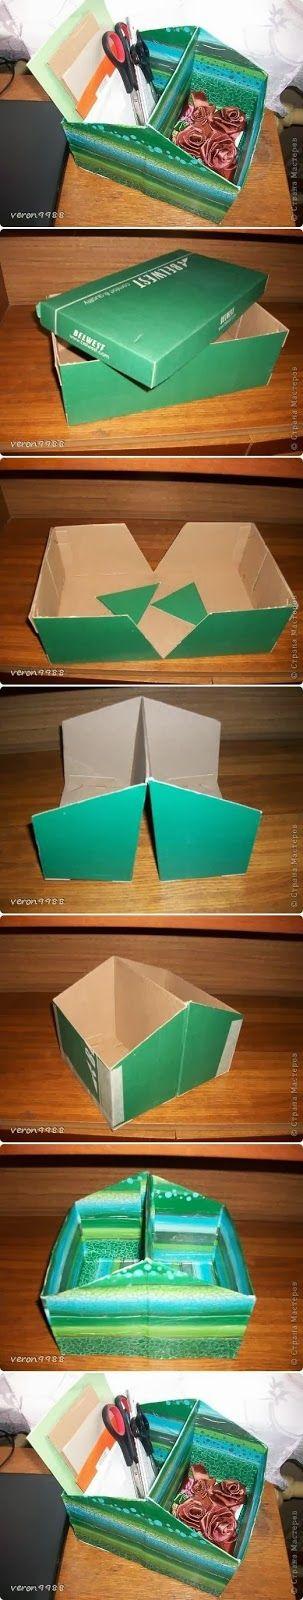 37814-Diy-Craft-Storage-Box